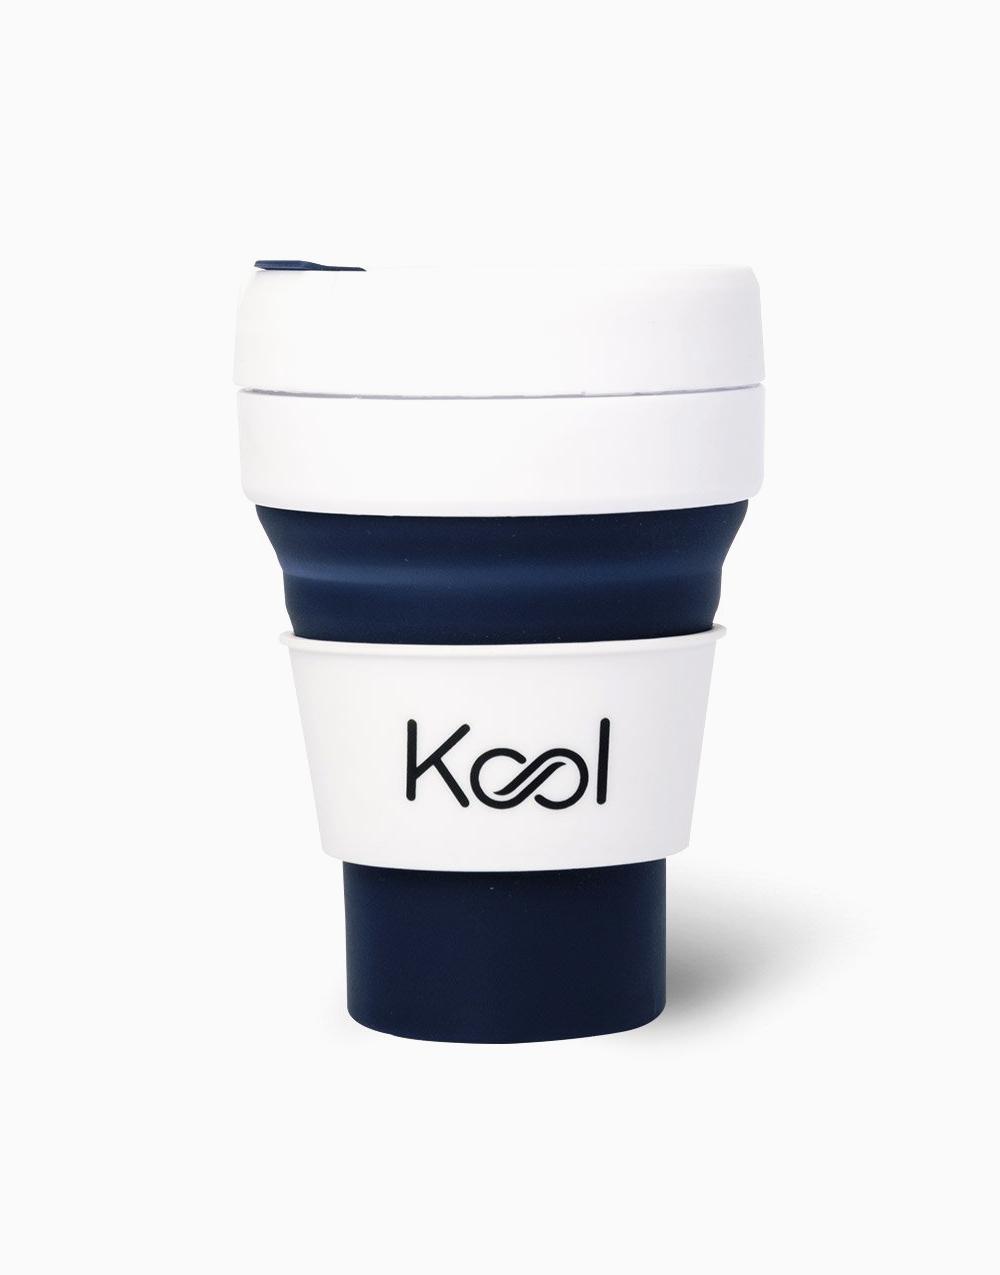 Kool Foldable Cup (355ml) by Kool | Cobalt